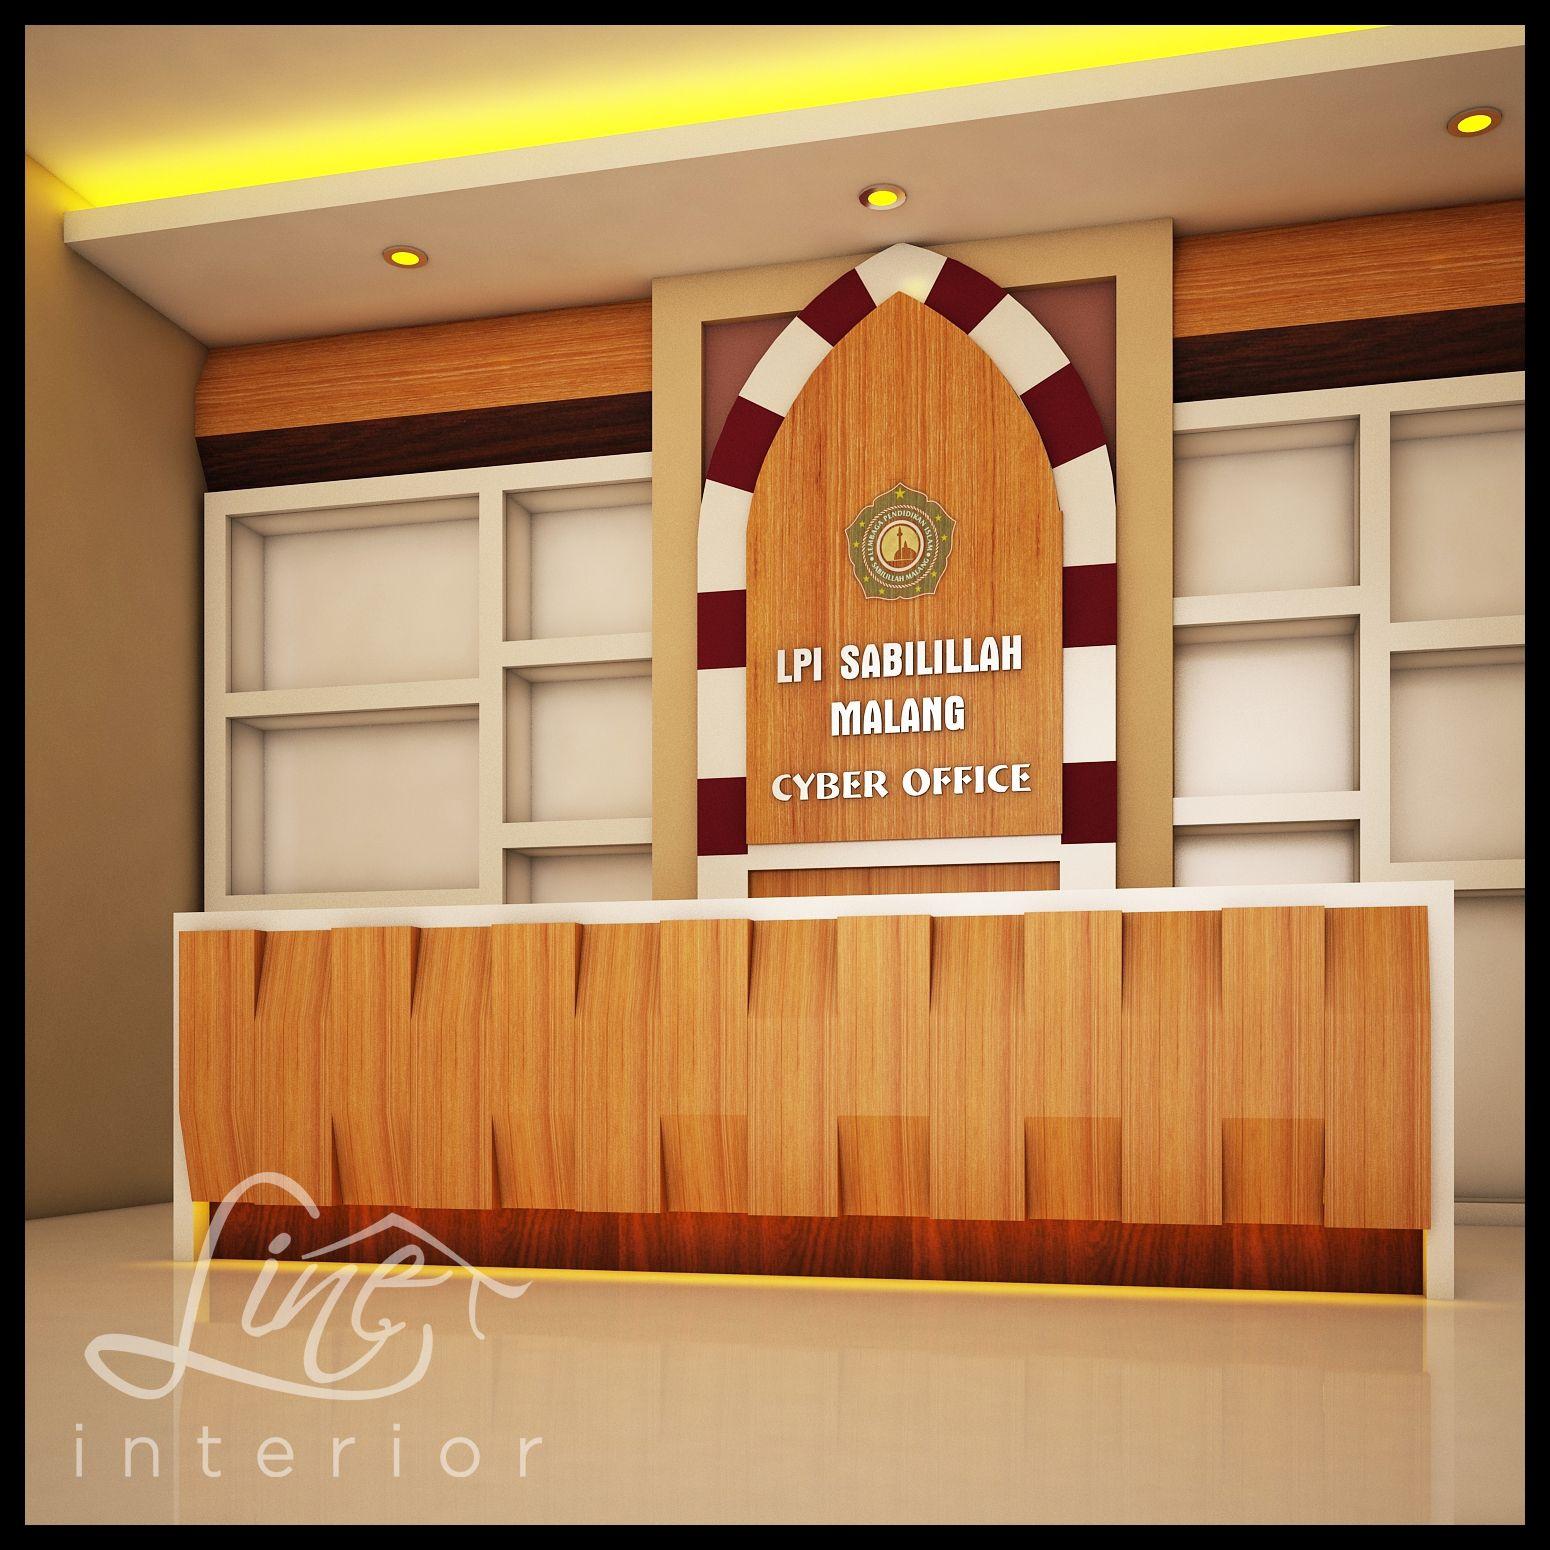 Project Reseptionist LPI Sabilillah 0822 3644 4481 || 0812 3320 1275